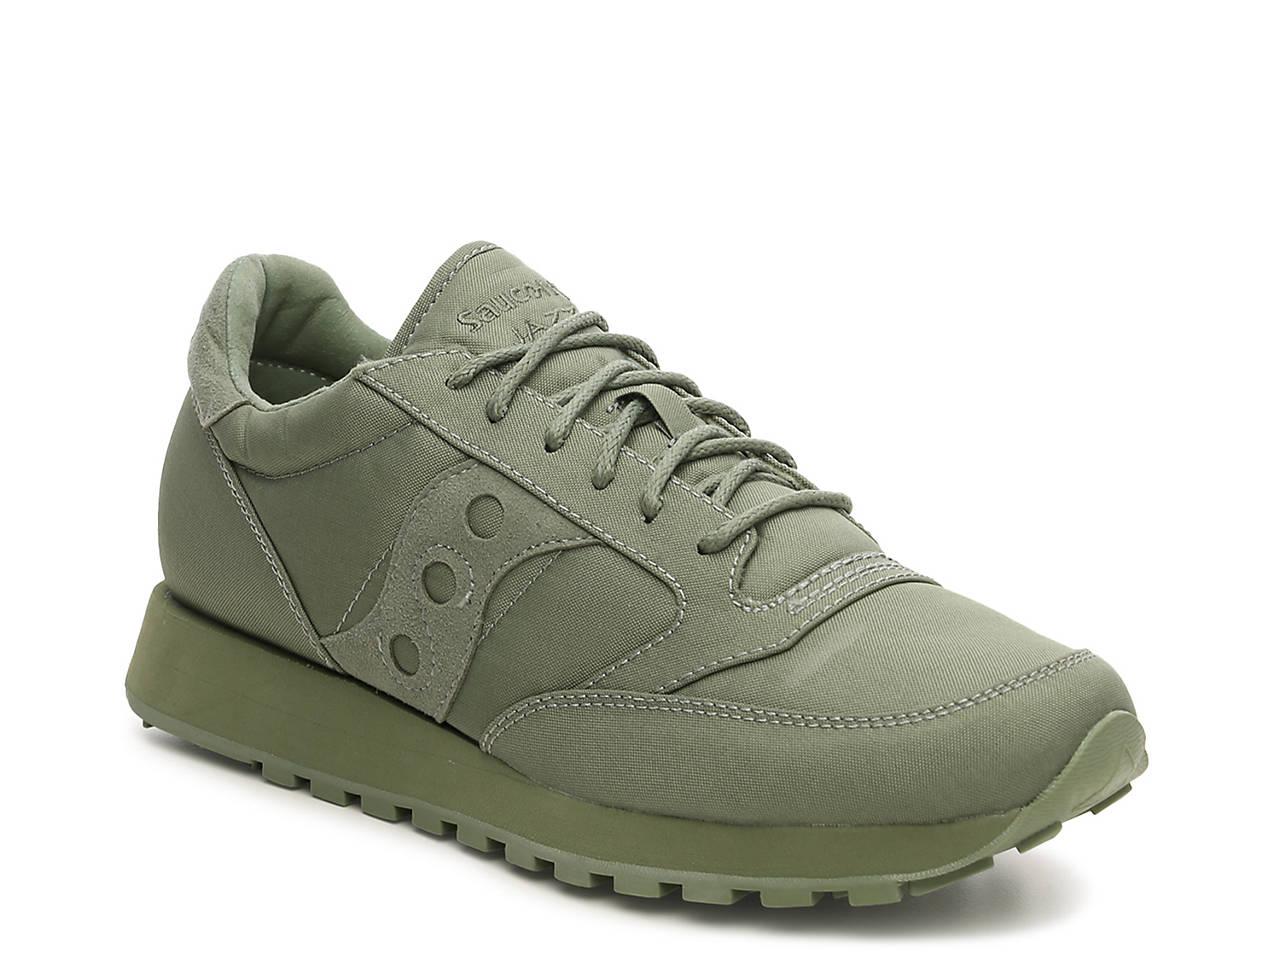 f3f0d3020 Saucony Jazz O Mono Retro Sneaker - Men s Men s Shoes